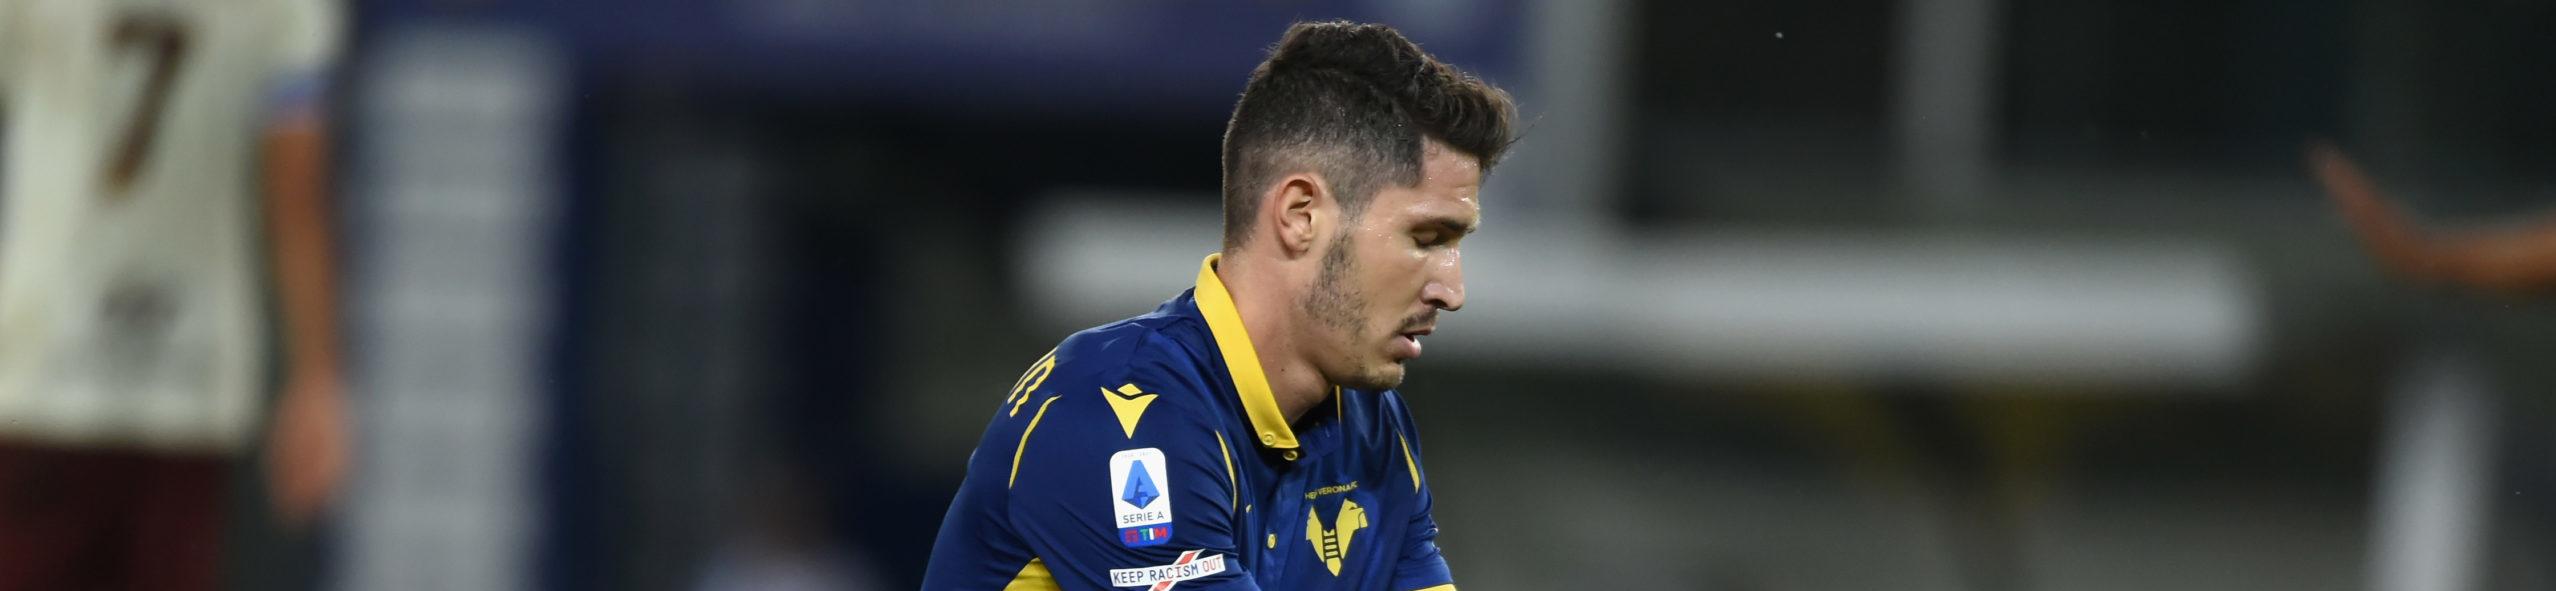 Pronostico Milan-Verona: Rebic out, Juric recupera Cetin – le ultimissime